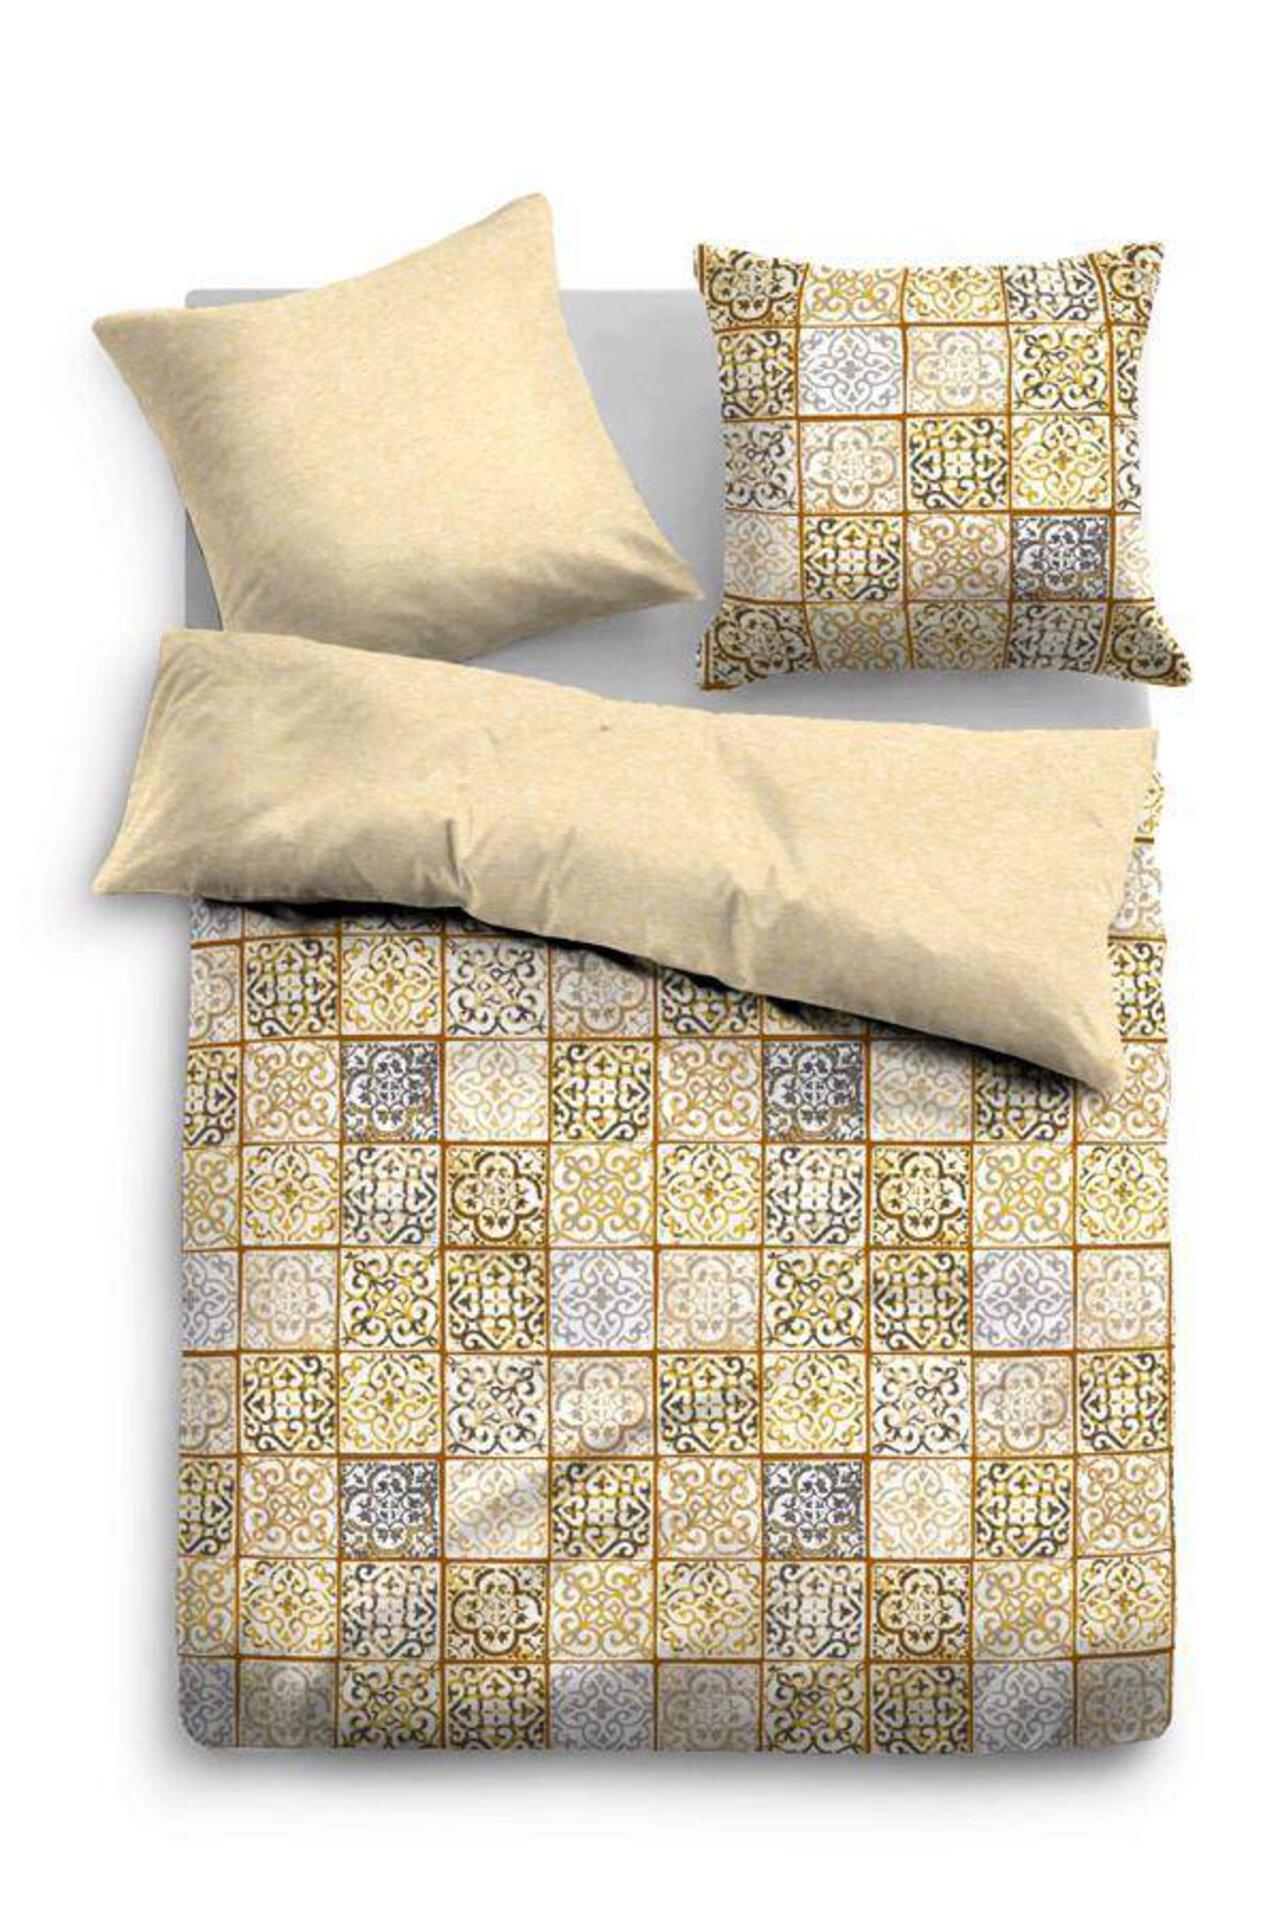 Satin-Bettwäsche Patchwork Ornamente Tom Tailor Textil 135 x 200 cm